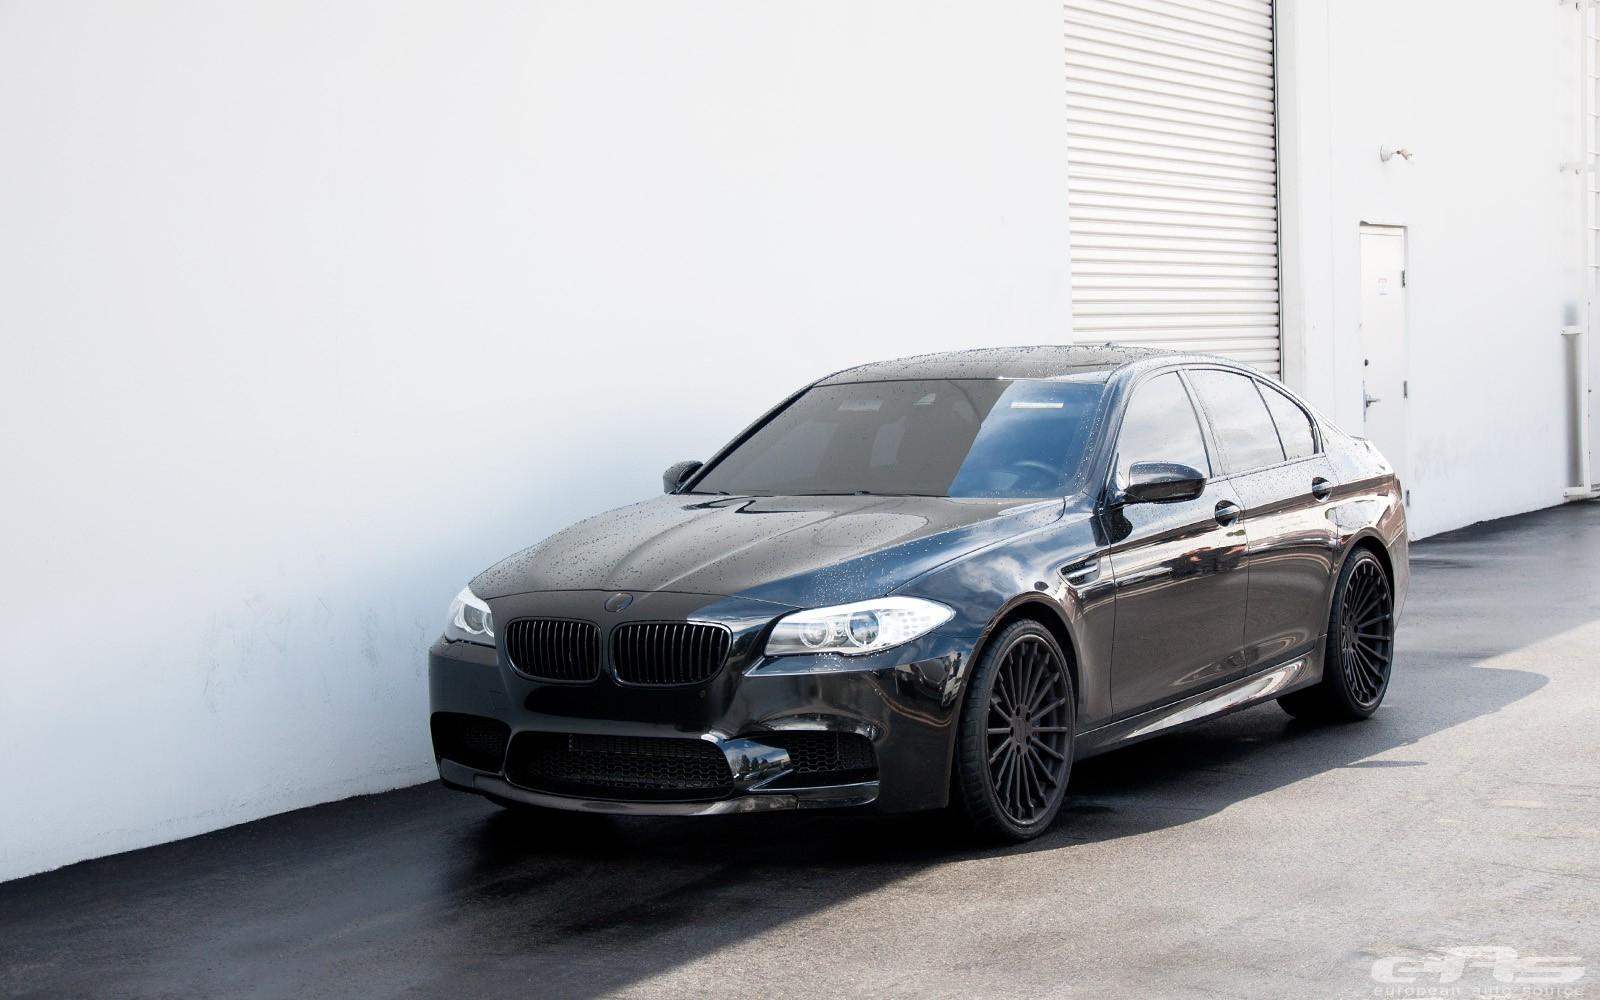 Sapphire Black BMW F M By European Auto Source GTspirit - All black bmw